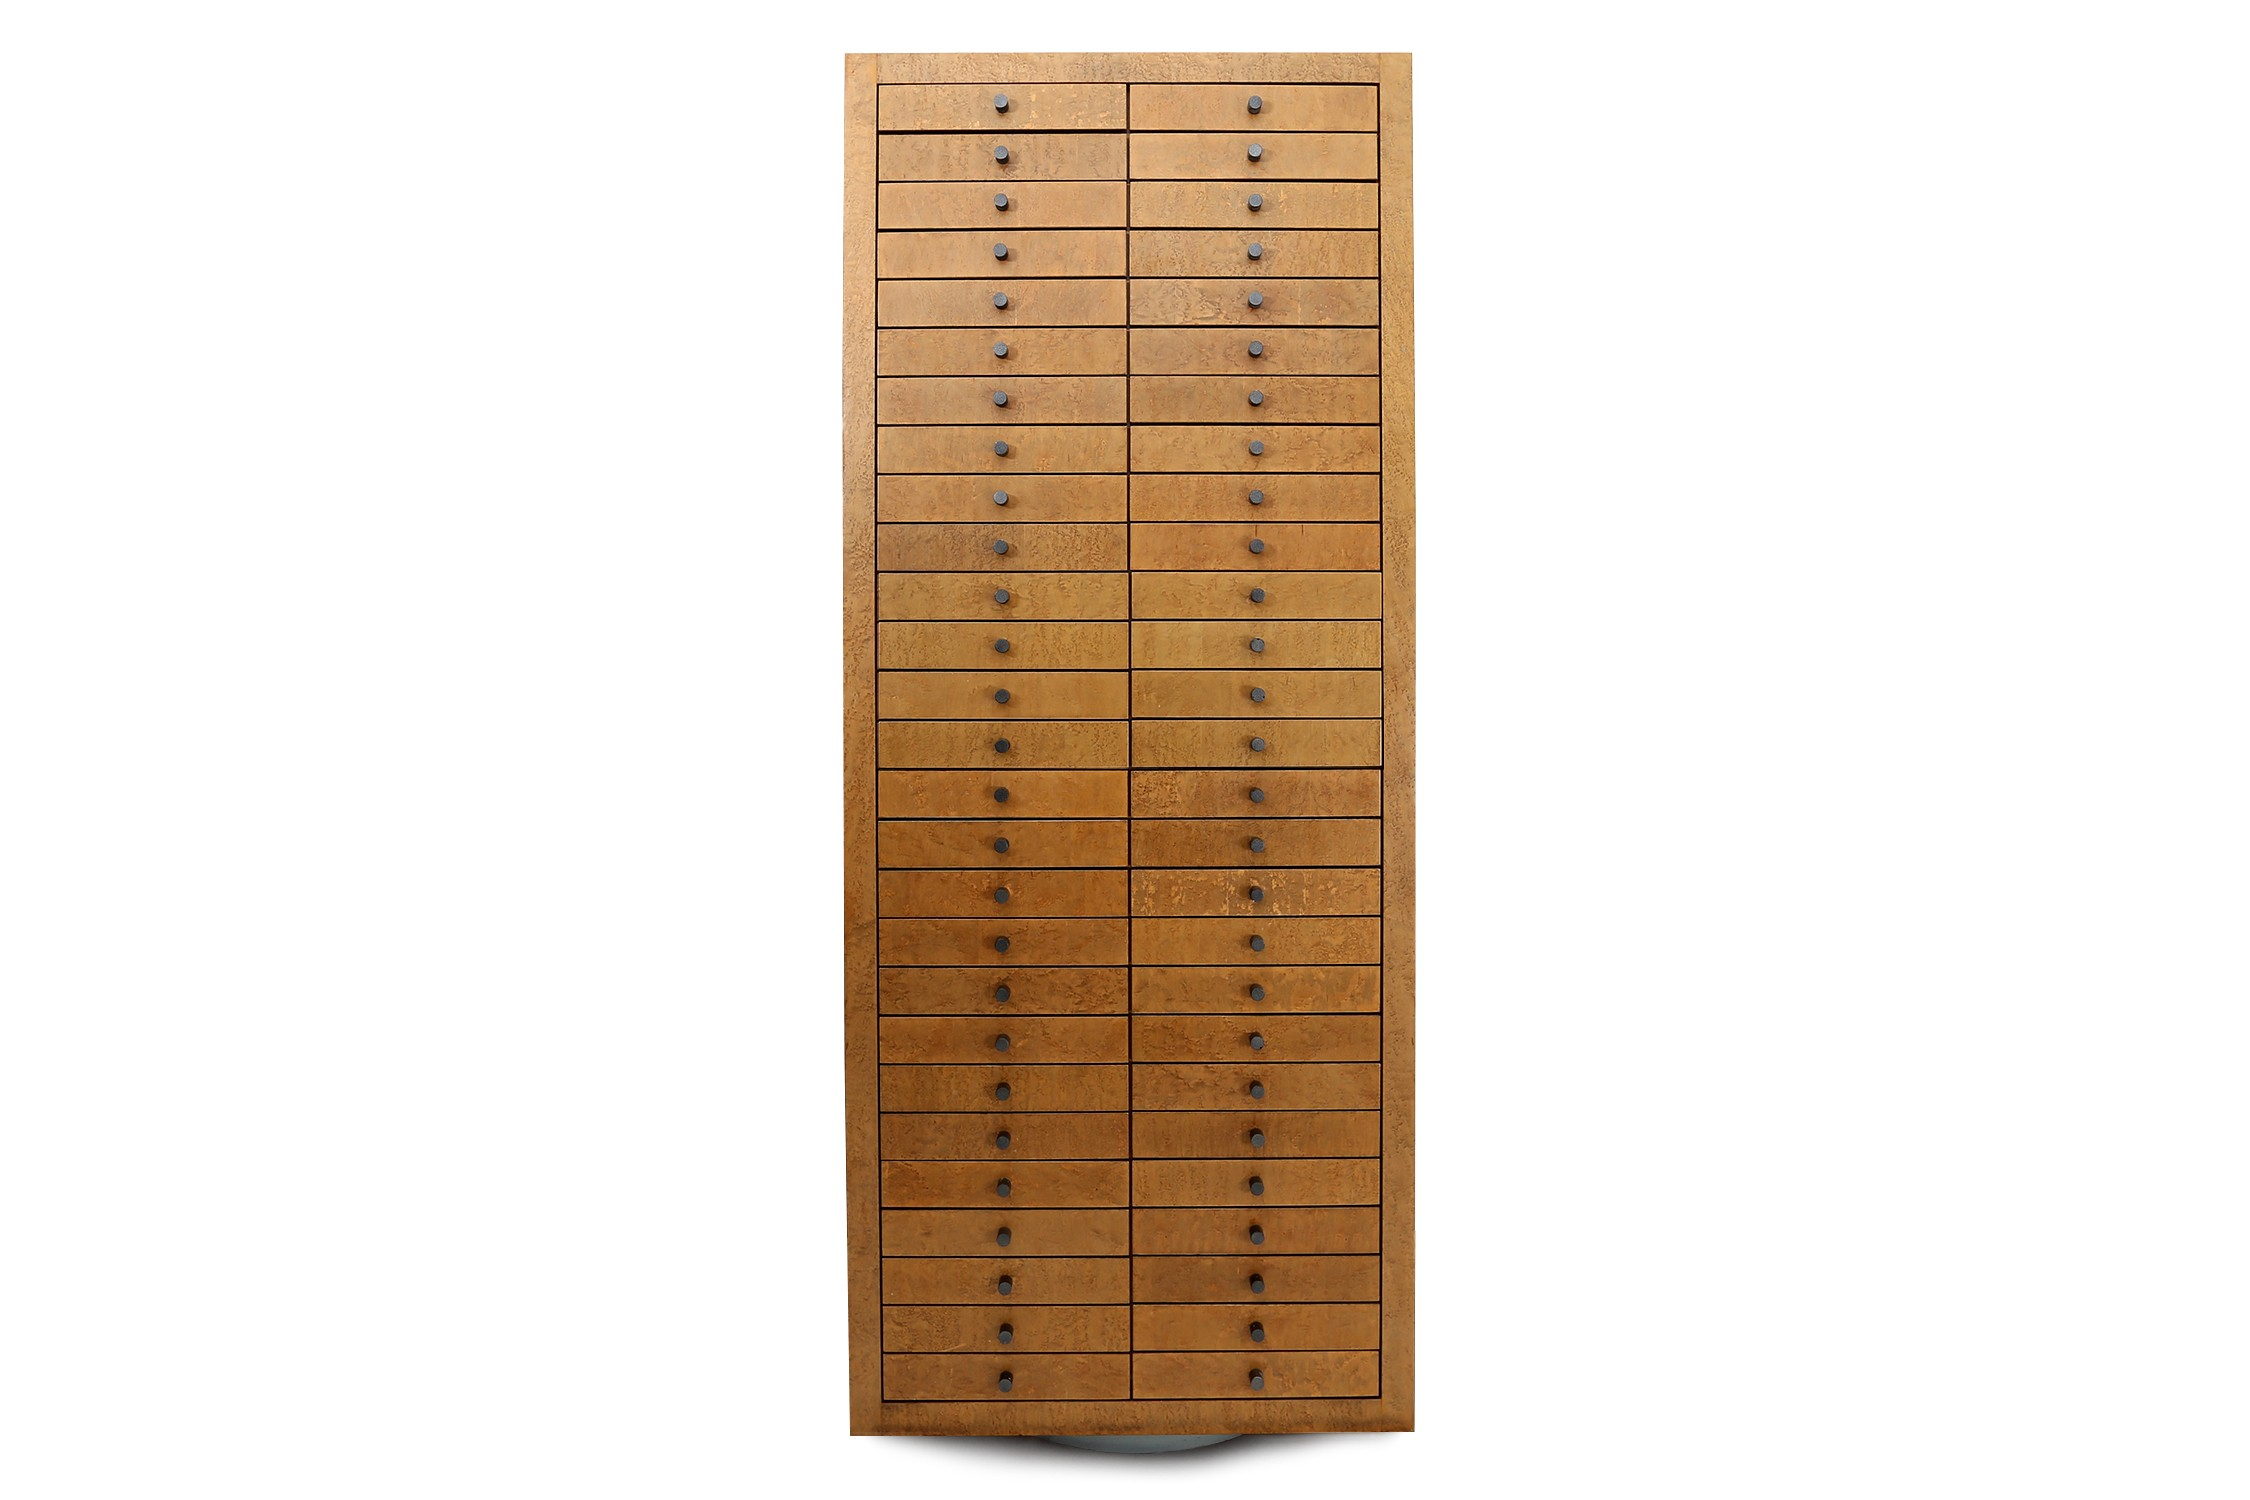 multi drawer wood and metal cabinet frans van praet 1980s me